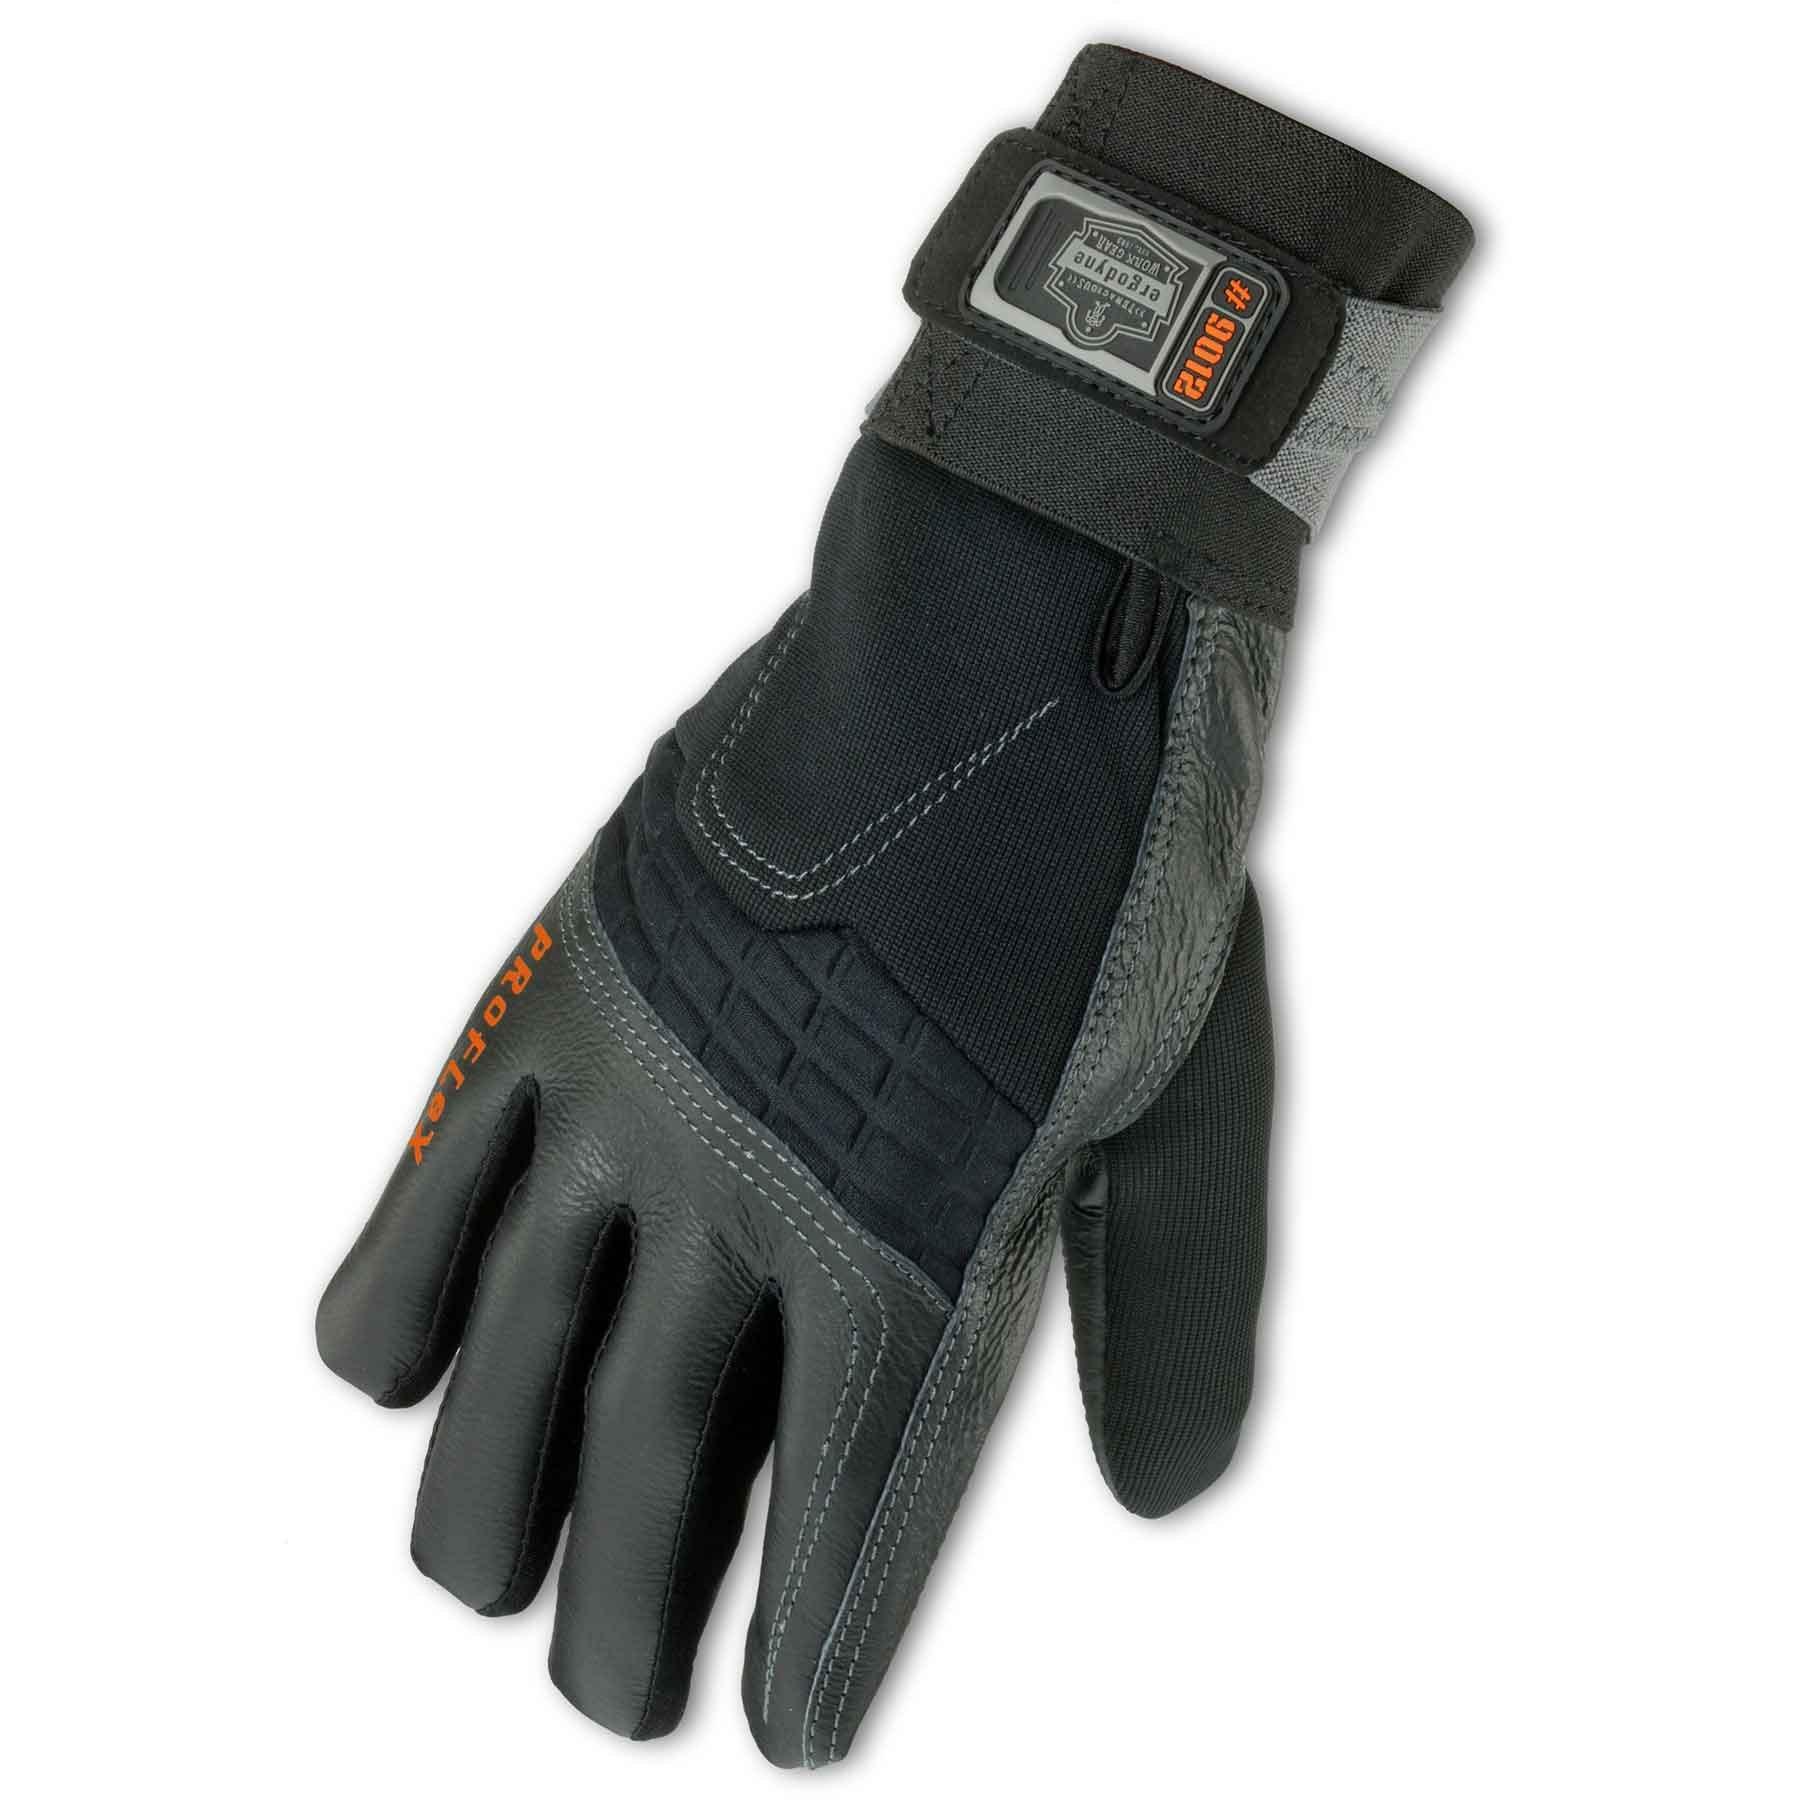 Ergodyne ProFlex 9012 Certified Anti-Vibration Work Glove with Wrist Support, X-Large, Black